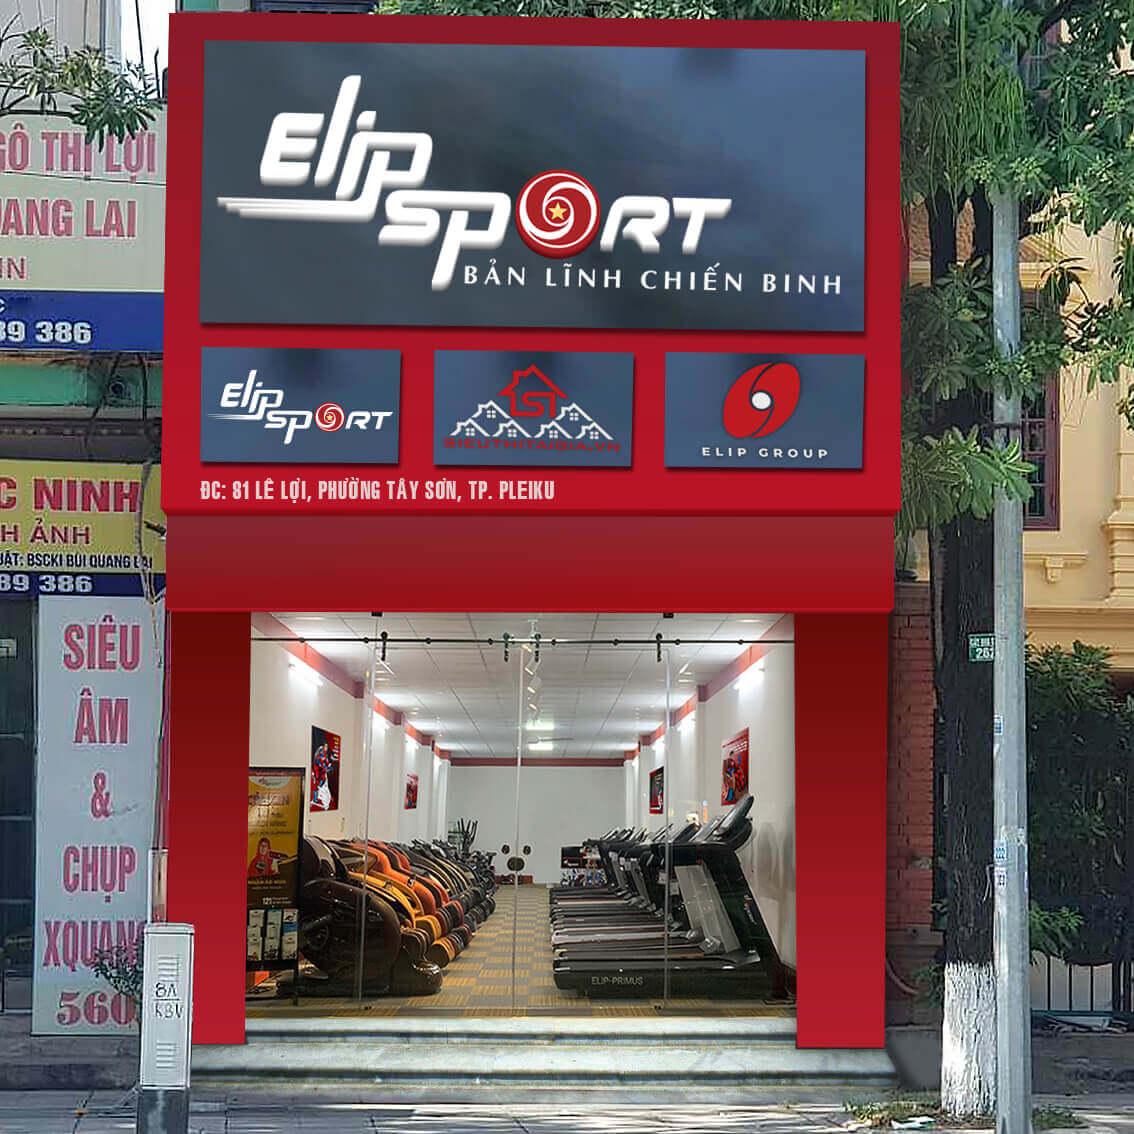 Chi nhánh Elipsport Gia Lai